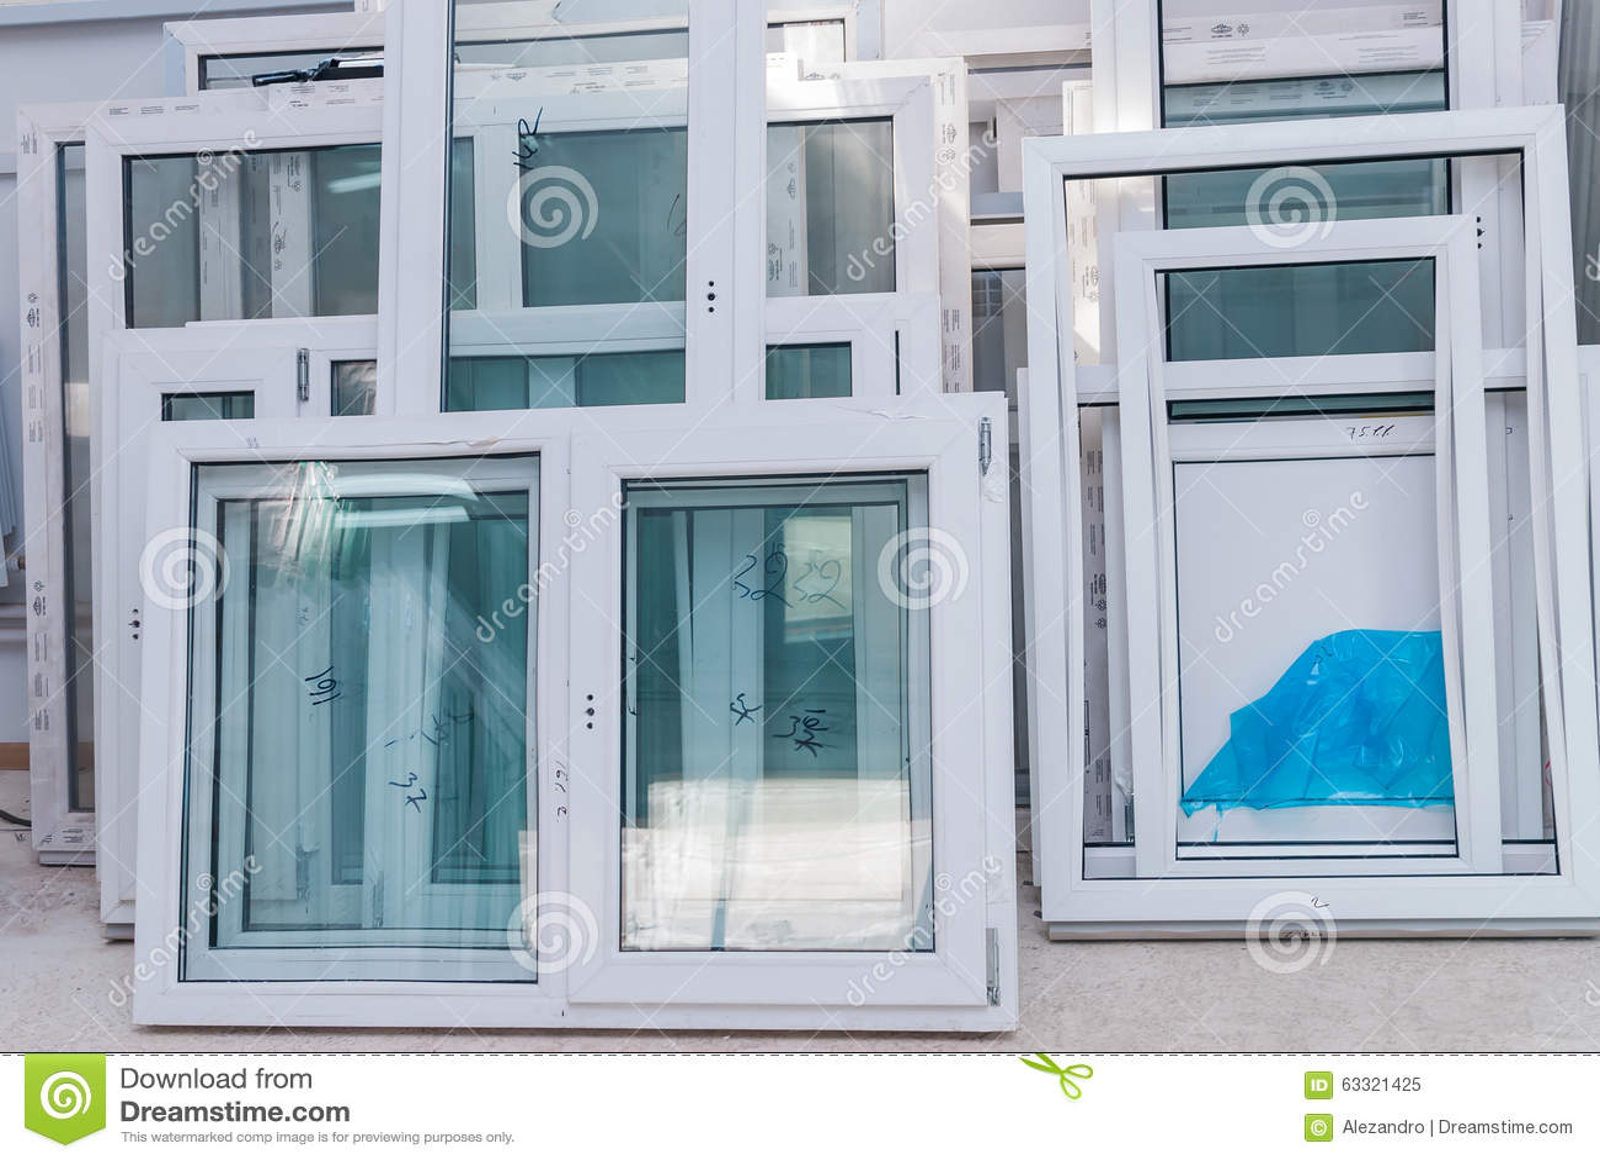 How to adjust the plastic windows